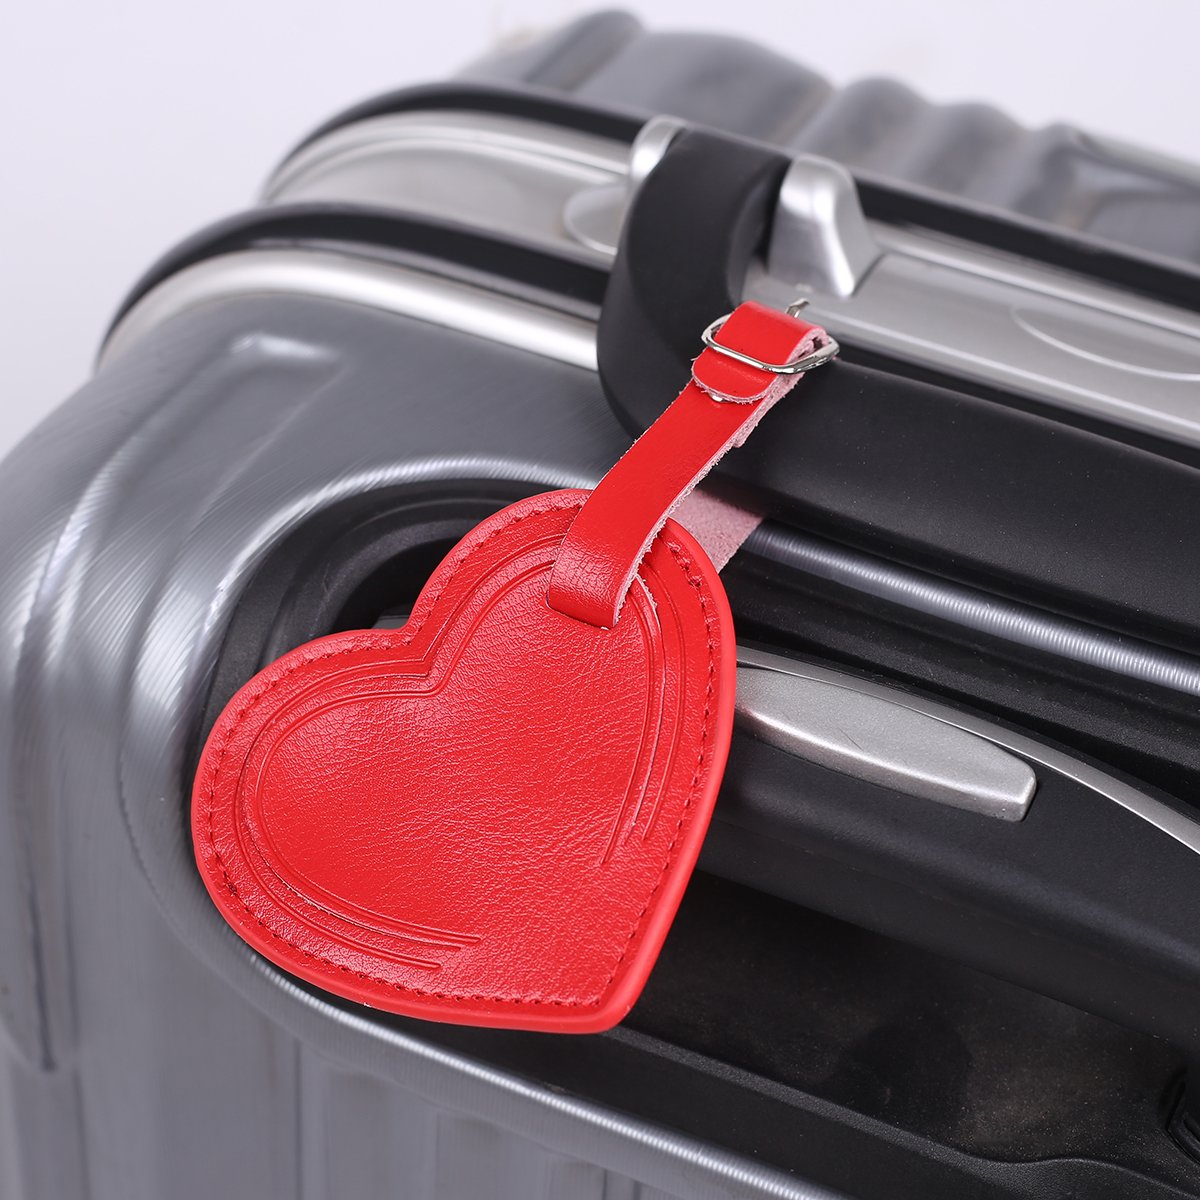 b558ddc77b9a AVIMA BEST Premium Handmade Leather Small Heart Luggage Travel ID ...